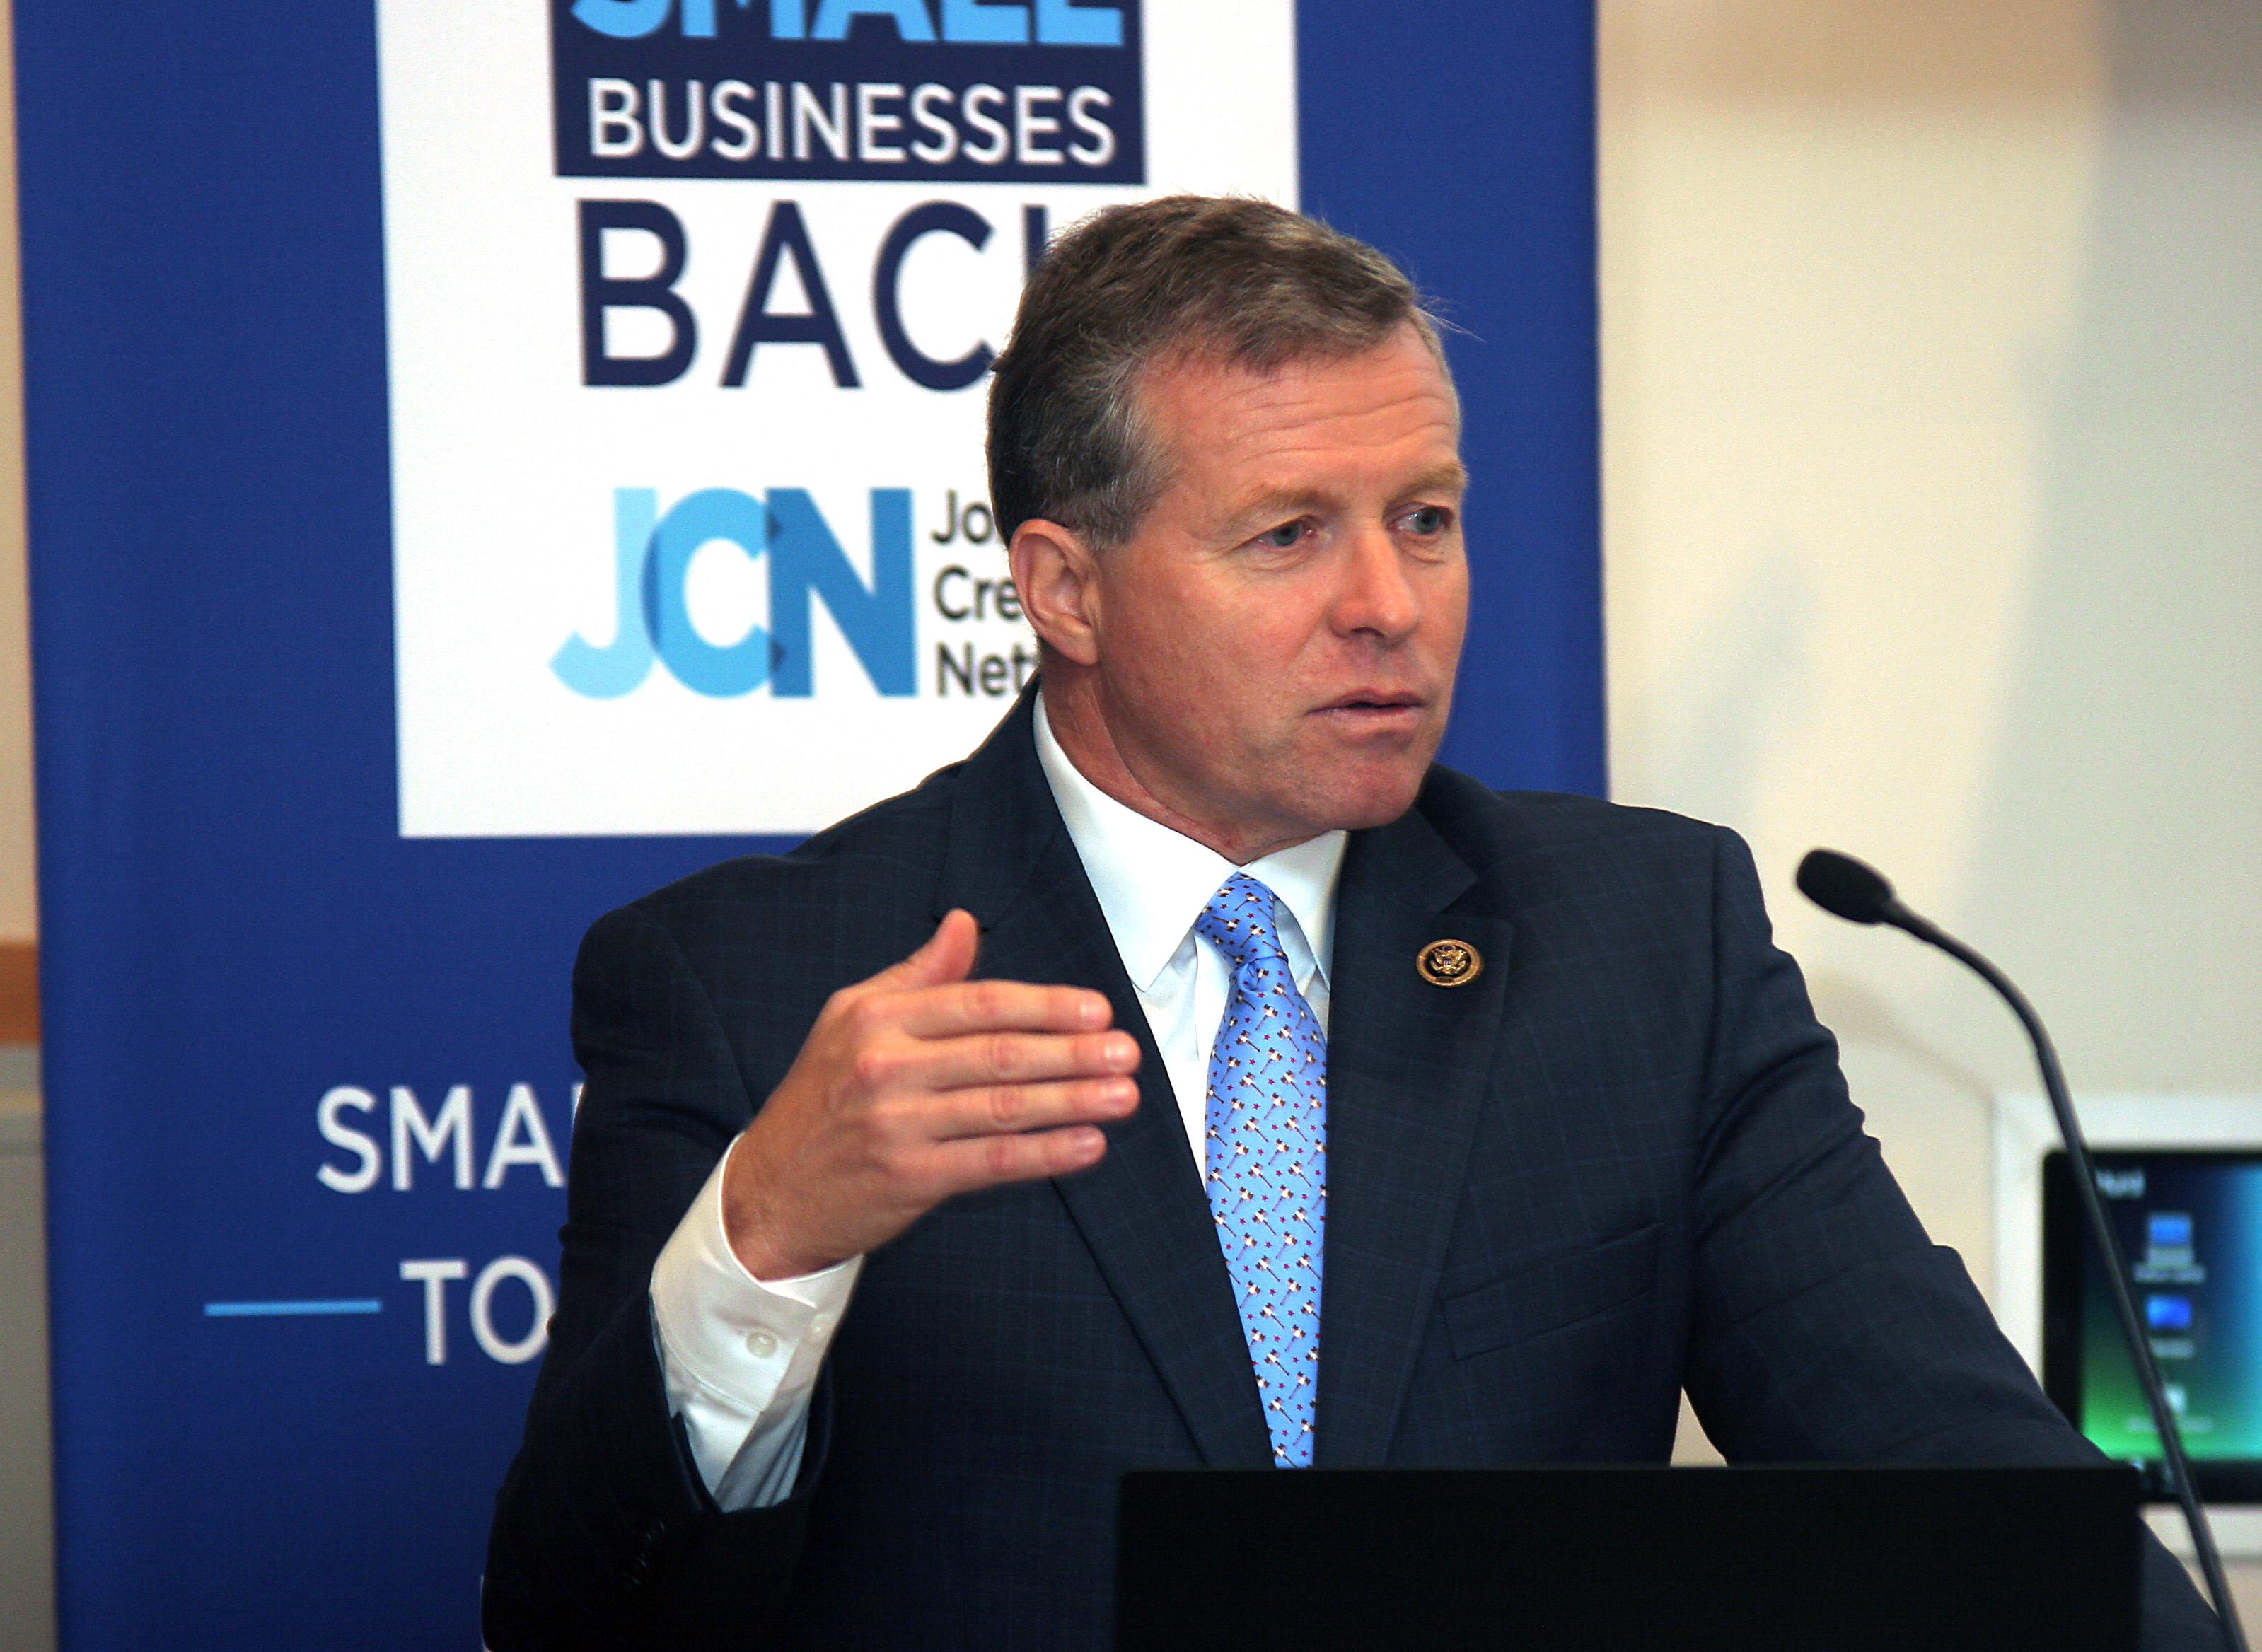 Bring Small Businesses Back - Rep  Charlie Dent - Job Creators Network